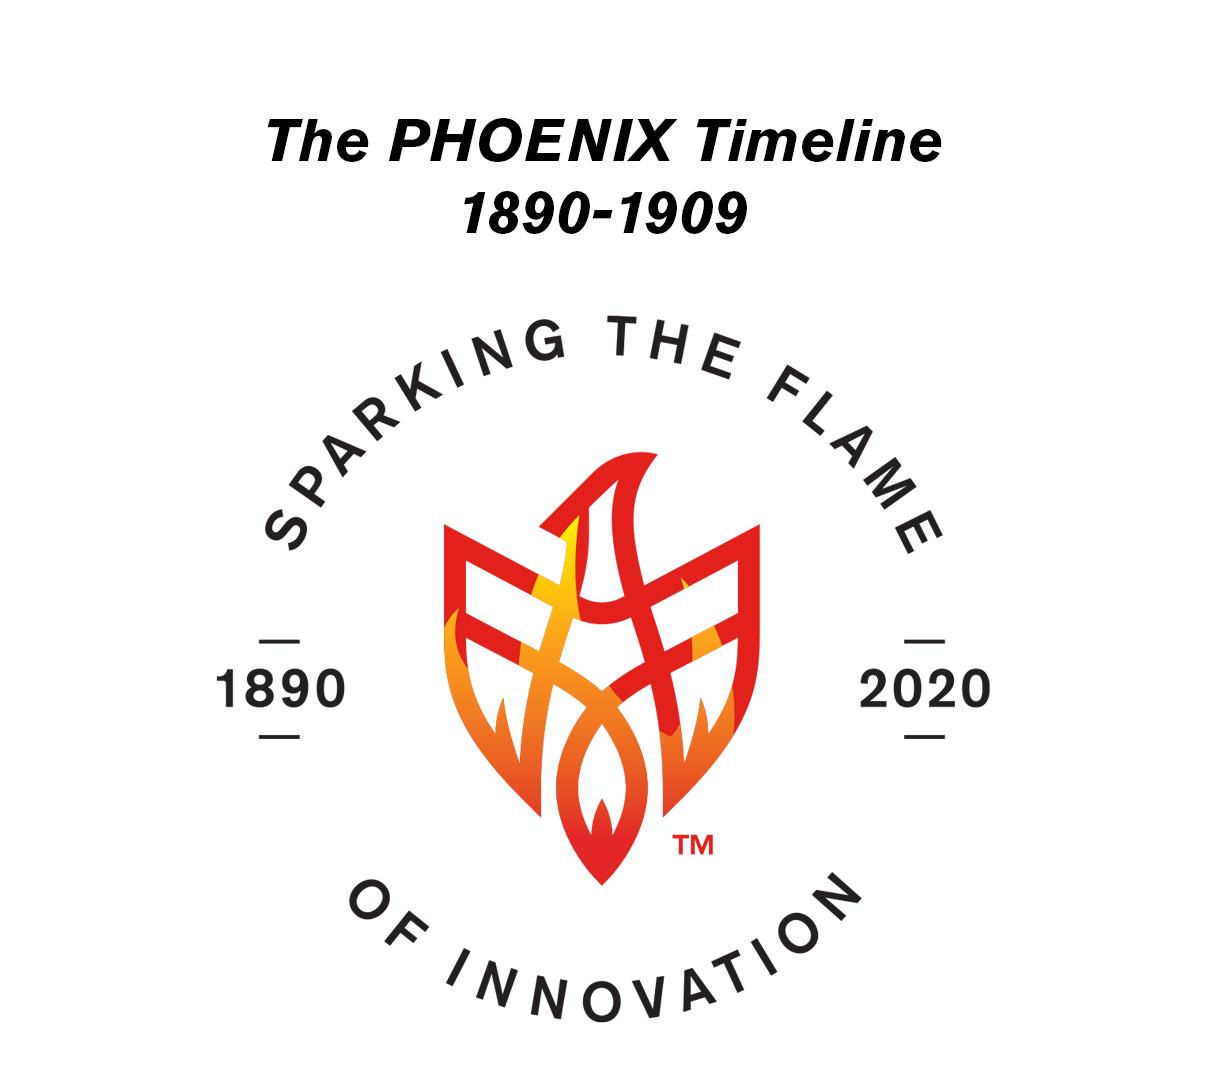 PHOENIX Celebrates 130 Years: The Early Years 1890-1909